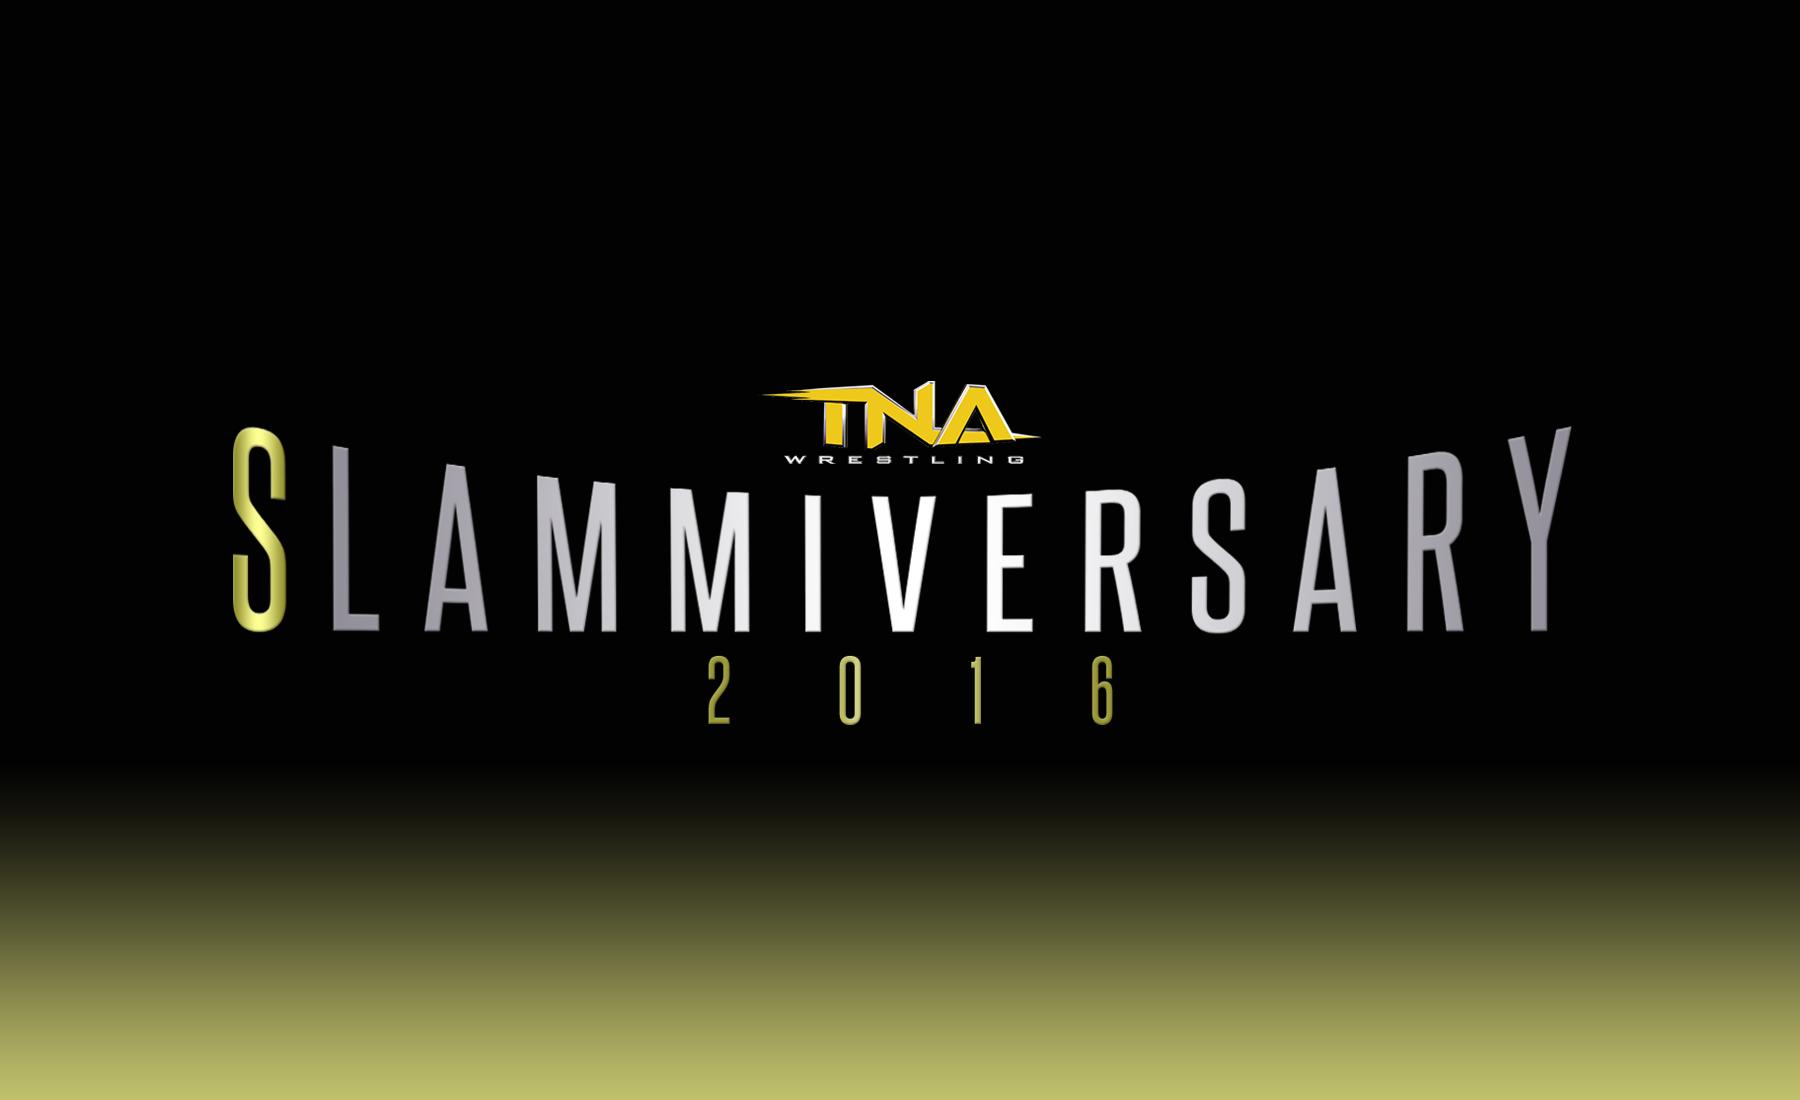 Slammiversary_Rotator-2